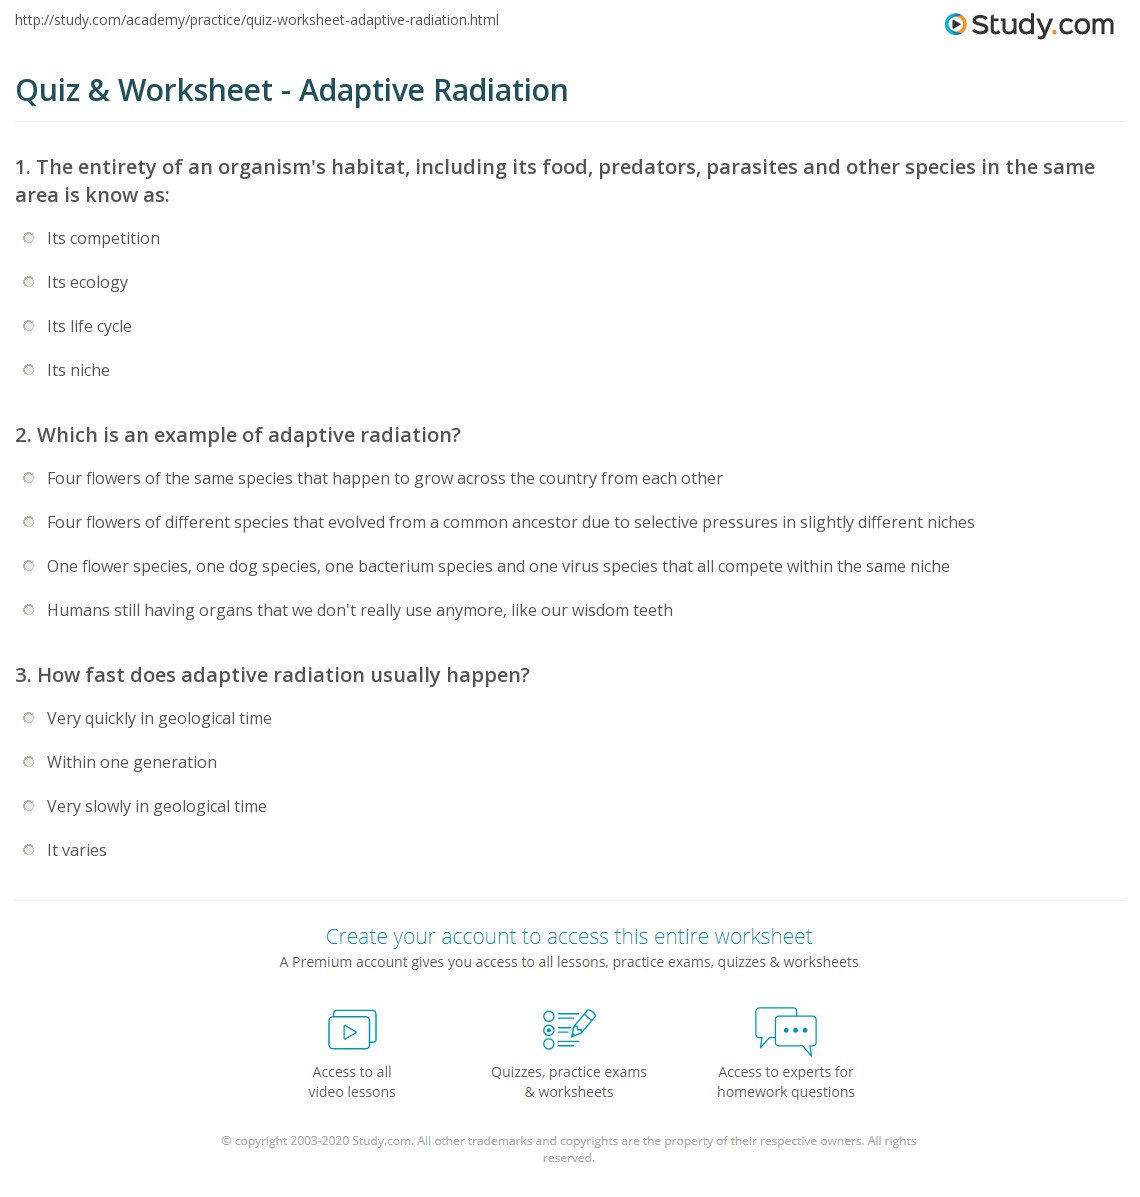 Quiz & Worksheet - Adaptive Radiation | Study.com